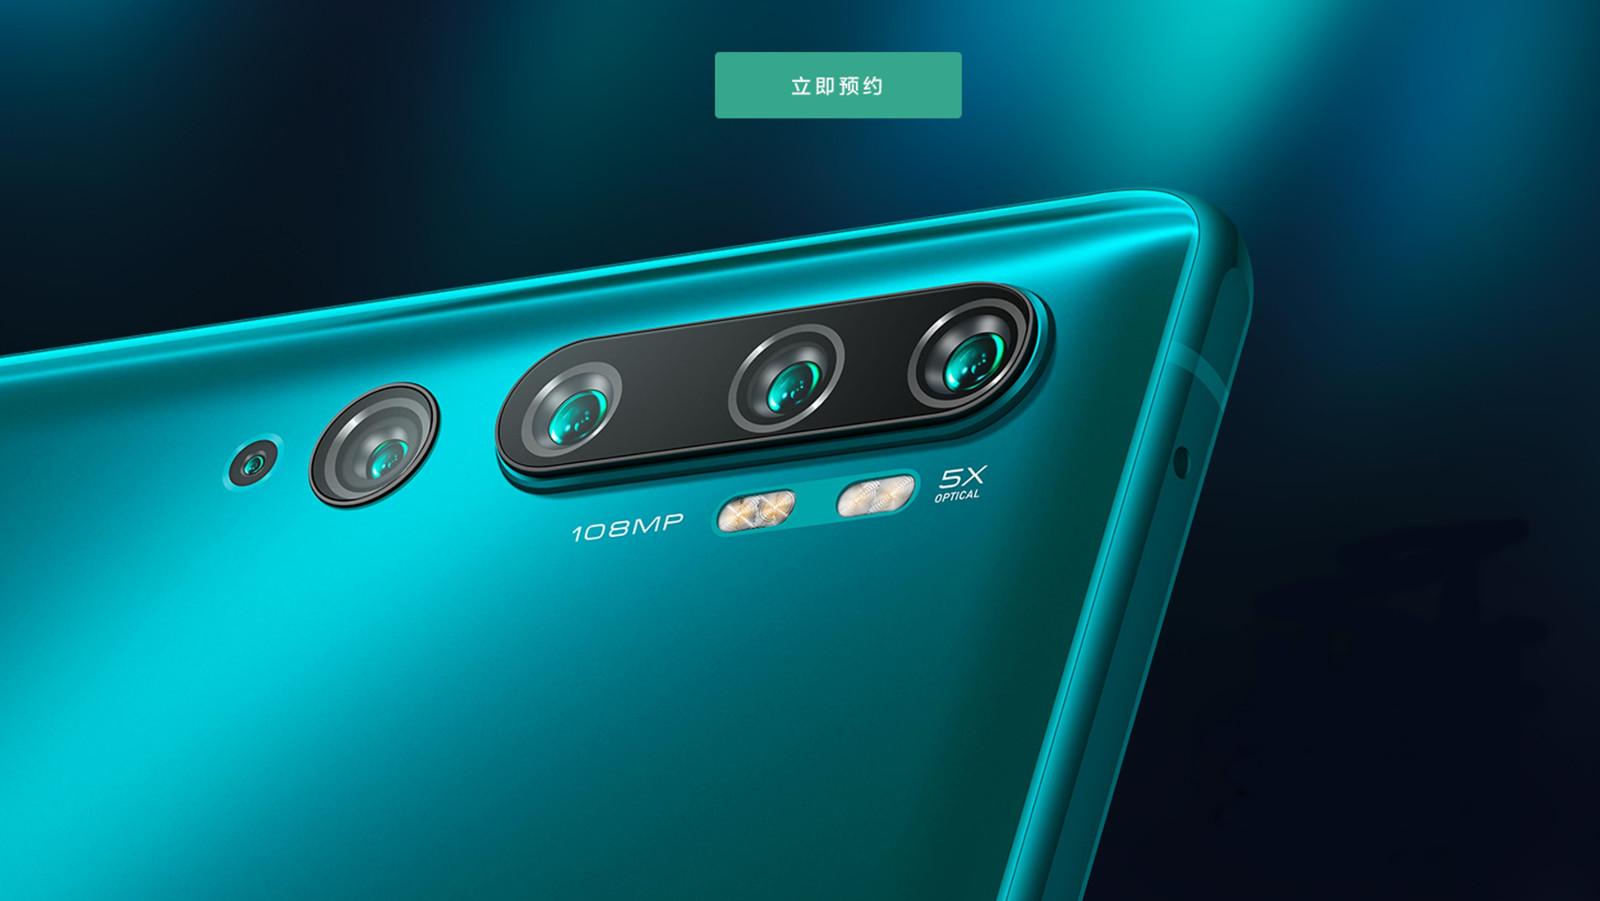 Sensores de cámara de 256MP próximamente; ¿Xiaomi o Realme lo traerán primero?